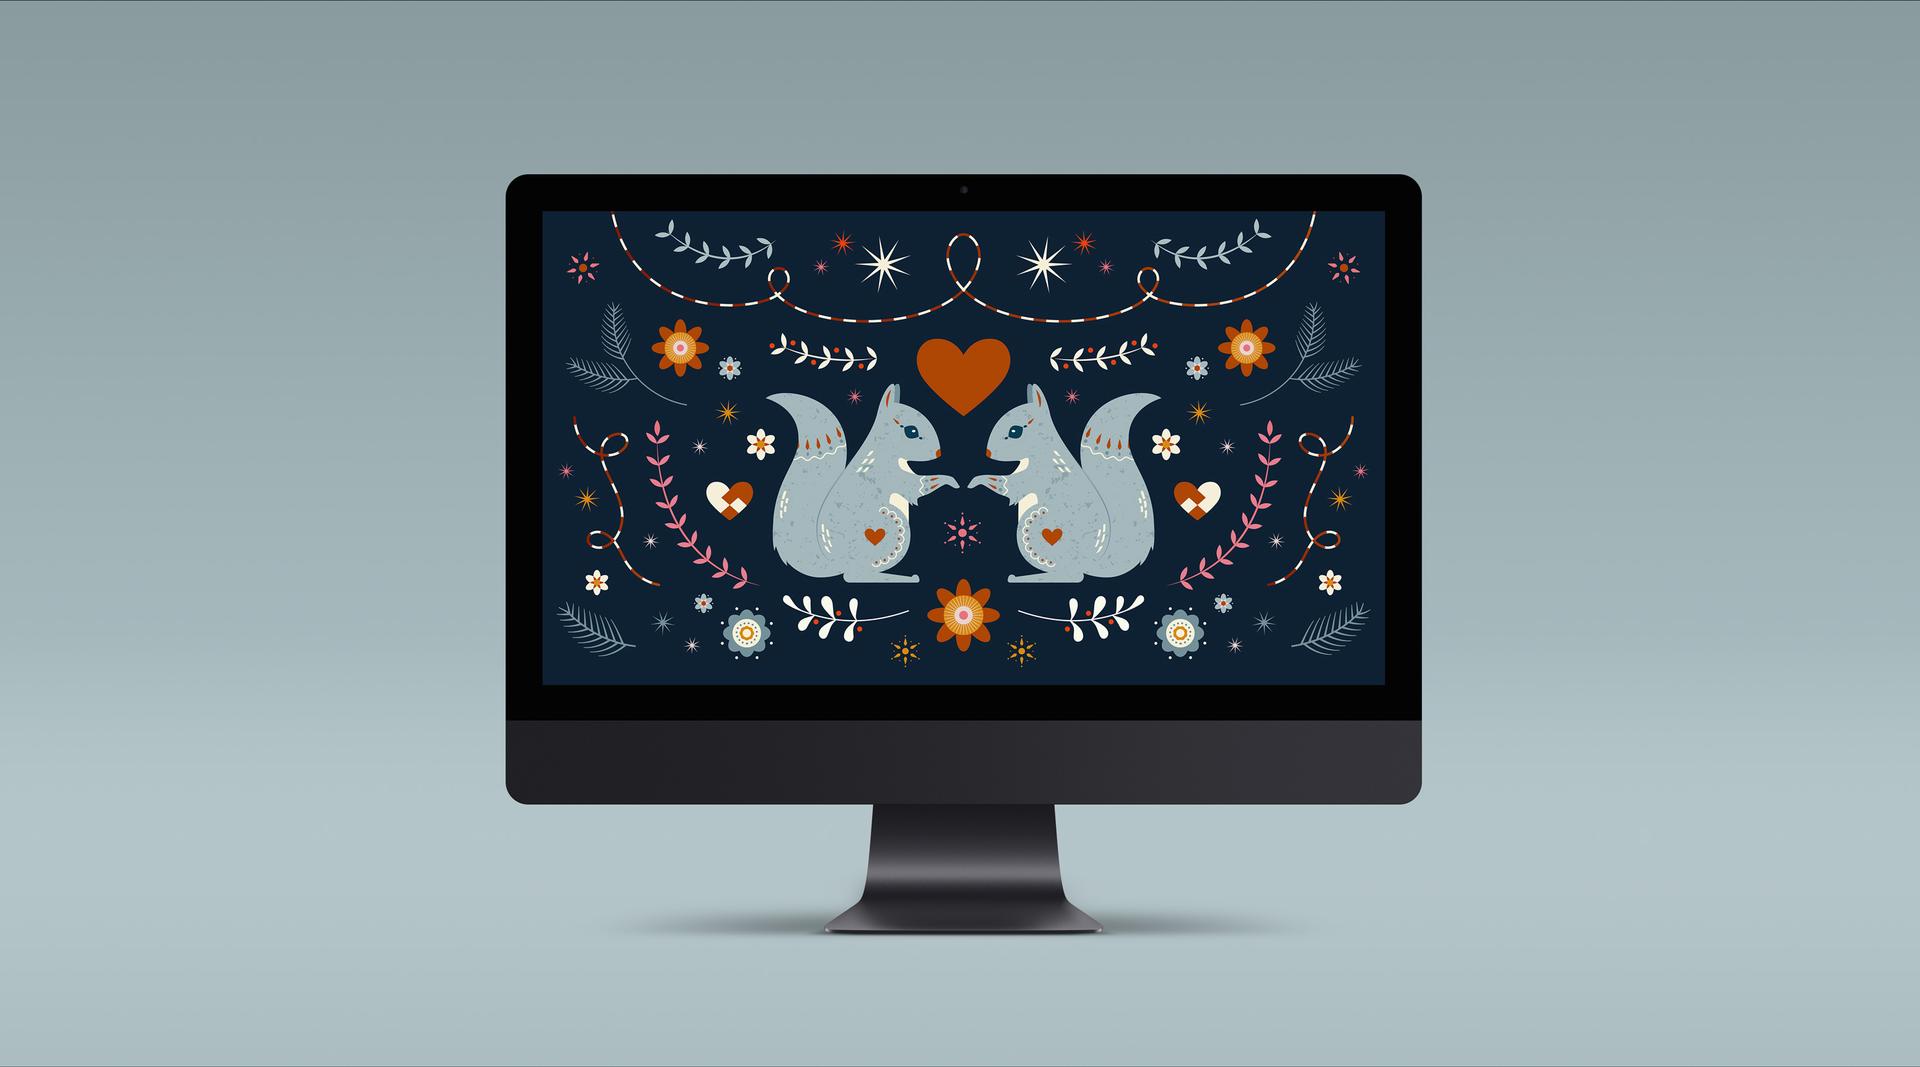 pattern_christmas_computerscreen_2019_st